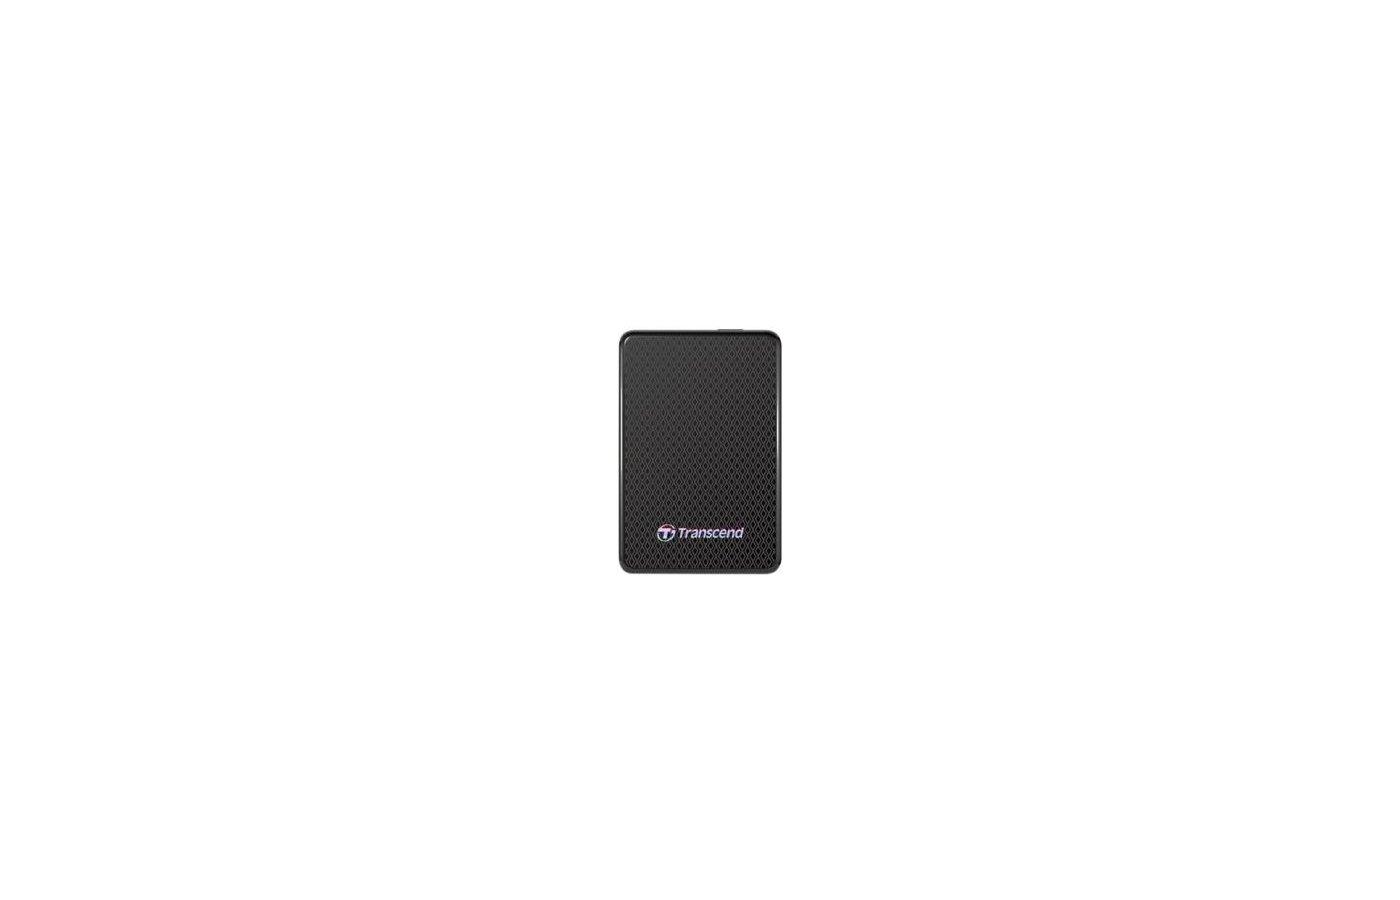 "Внешний жесткий диск Transcend TS512GESD400K 512GB, 2.5"" SSD, USB 3.0, MLC"